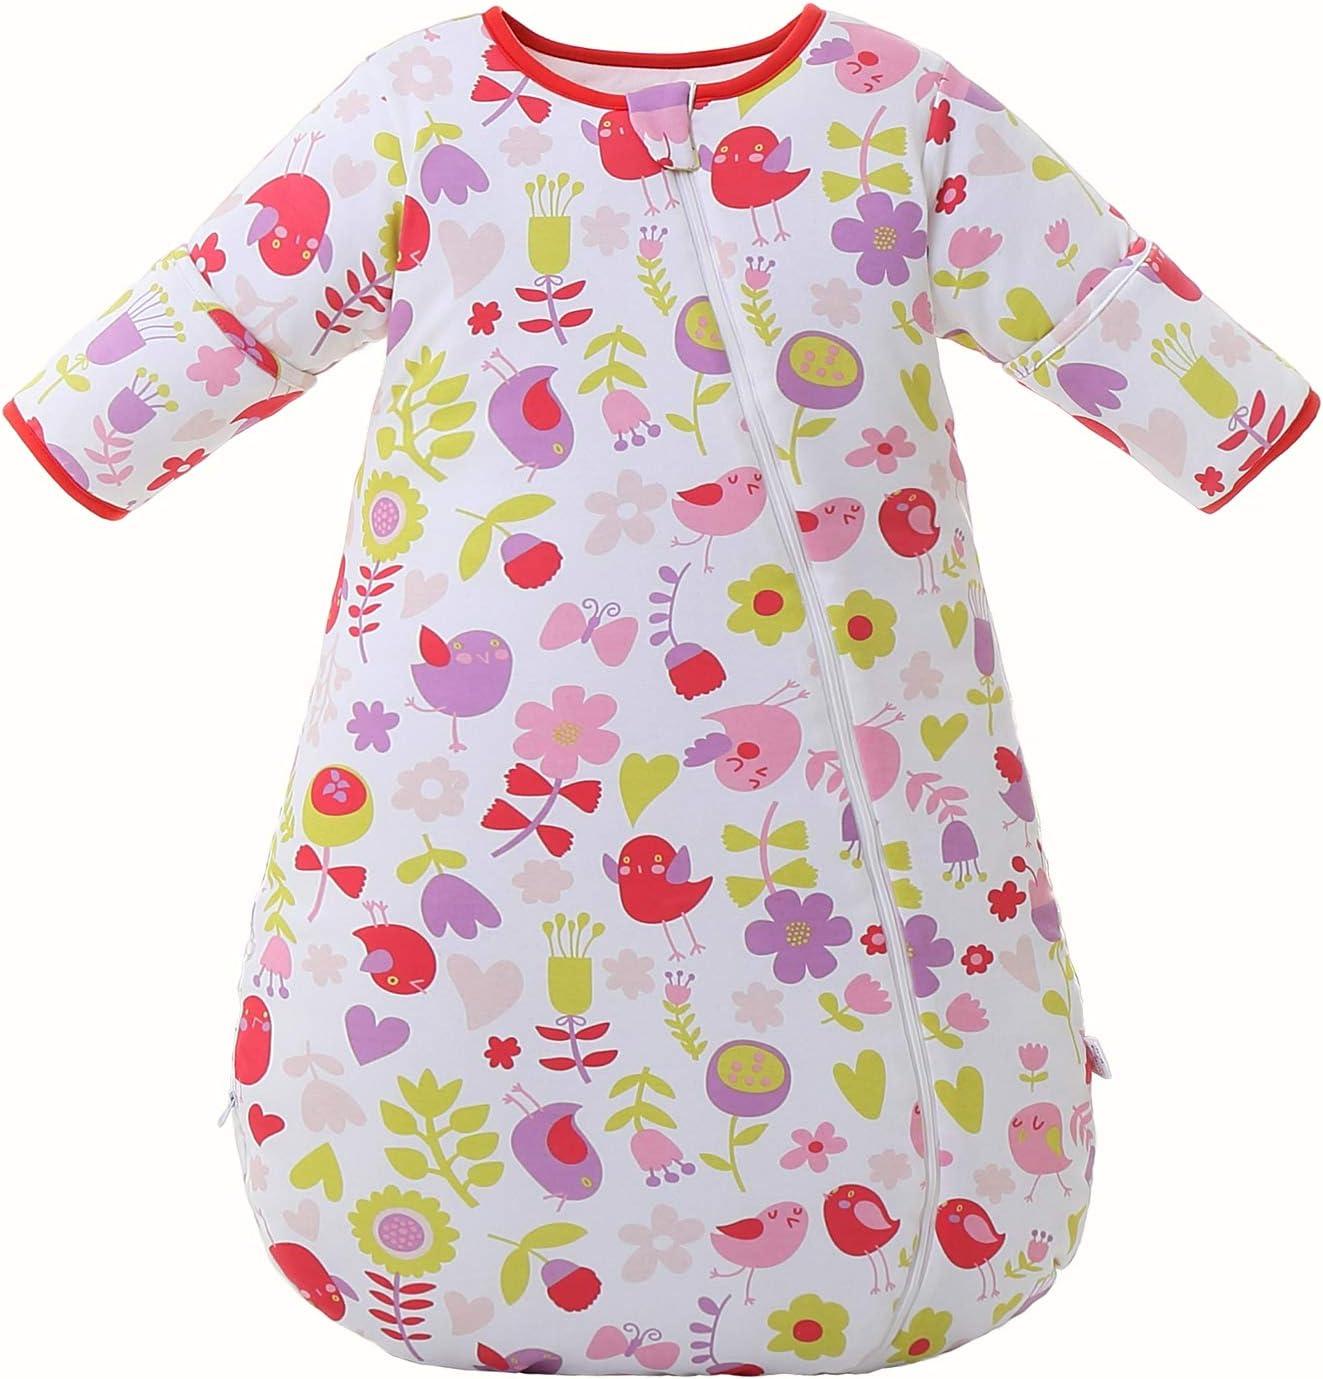 Baby Sleeping Bag Long Sleeves Winter 2.5-3.5Tog 100/% Organic Cotton Sleeping Bag L :30-36in//15-30 Months